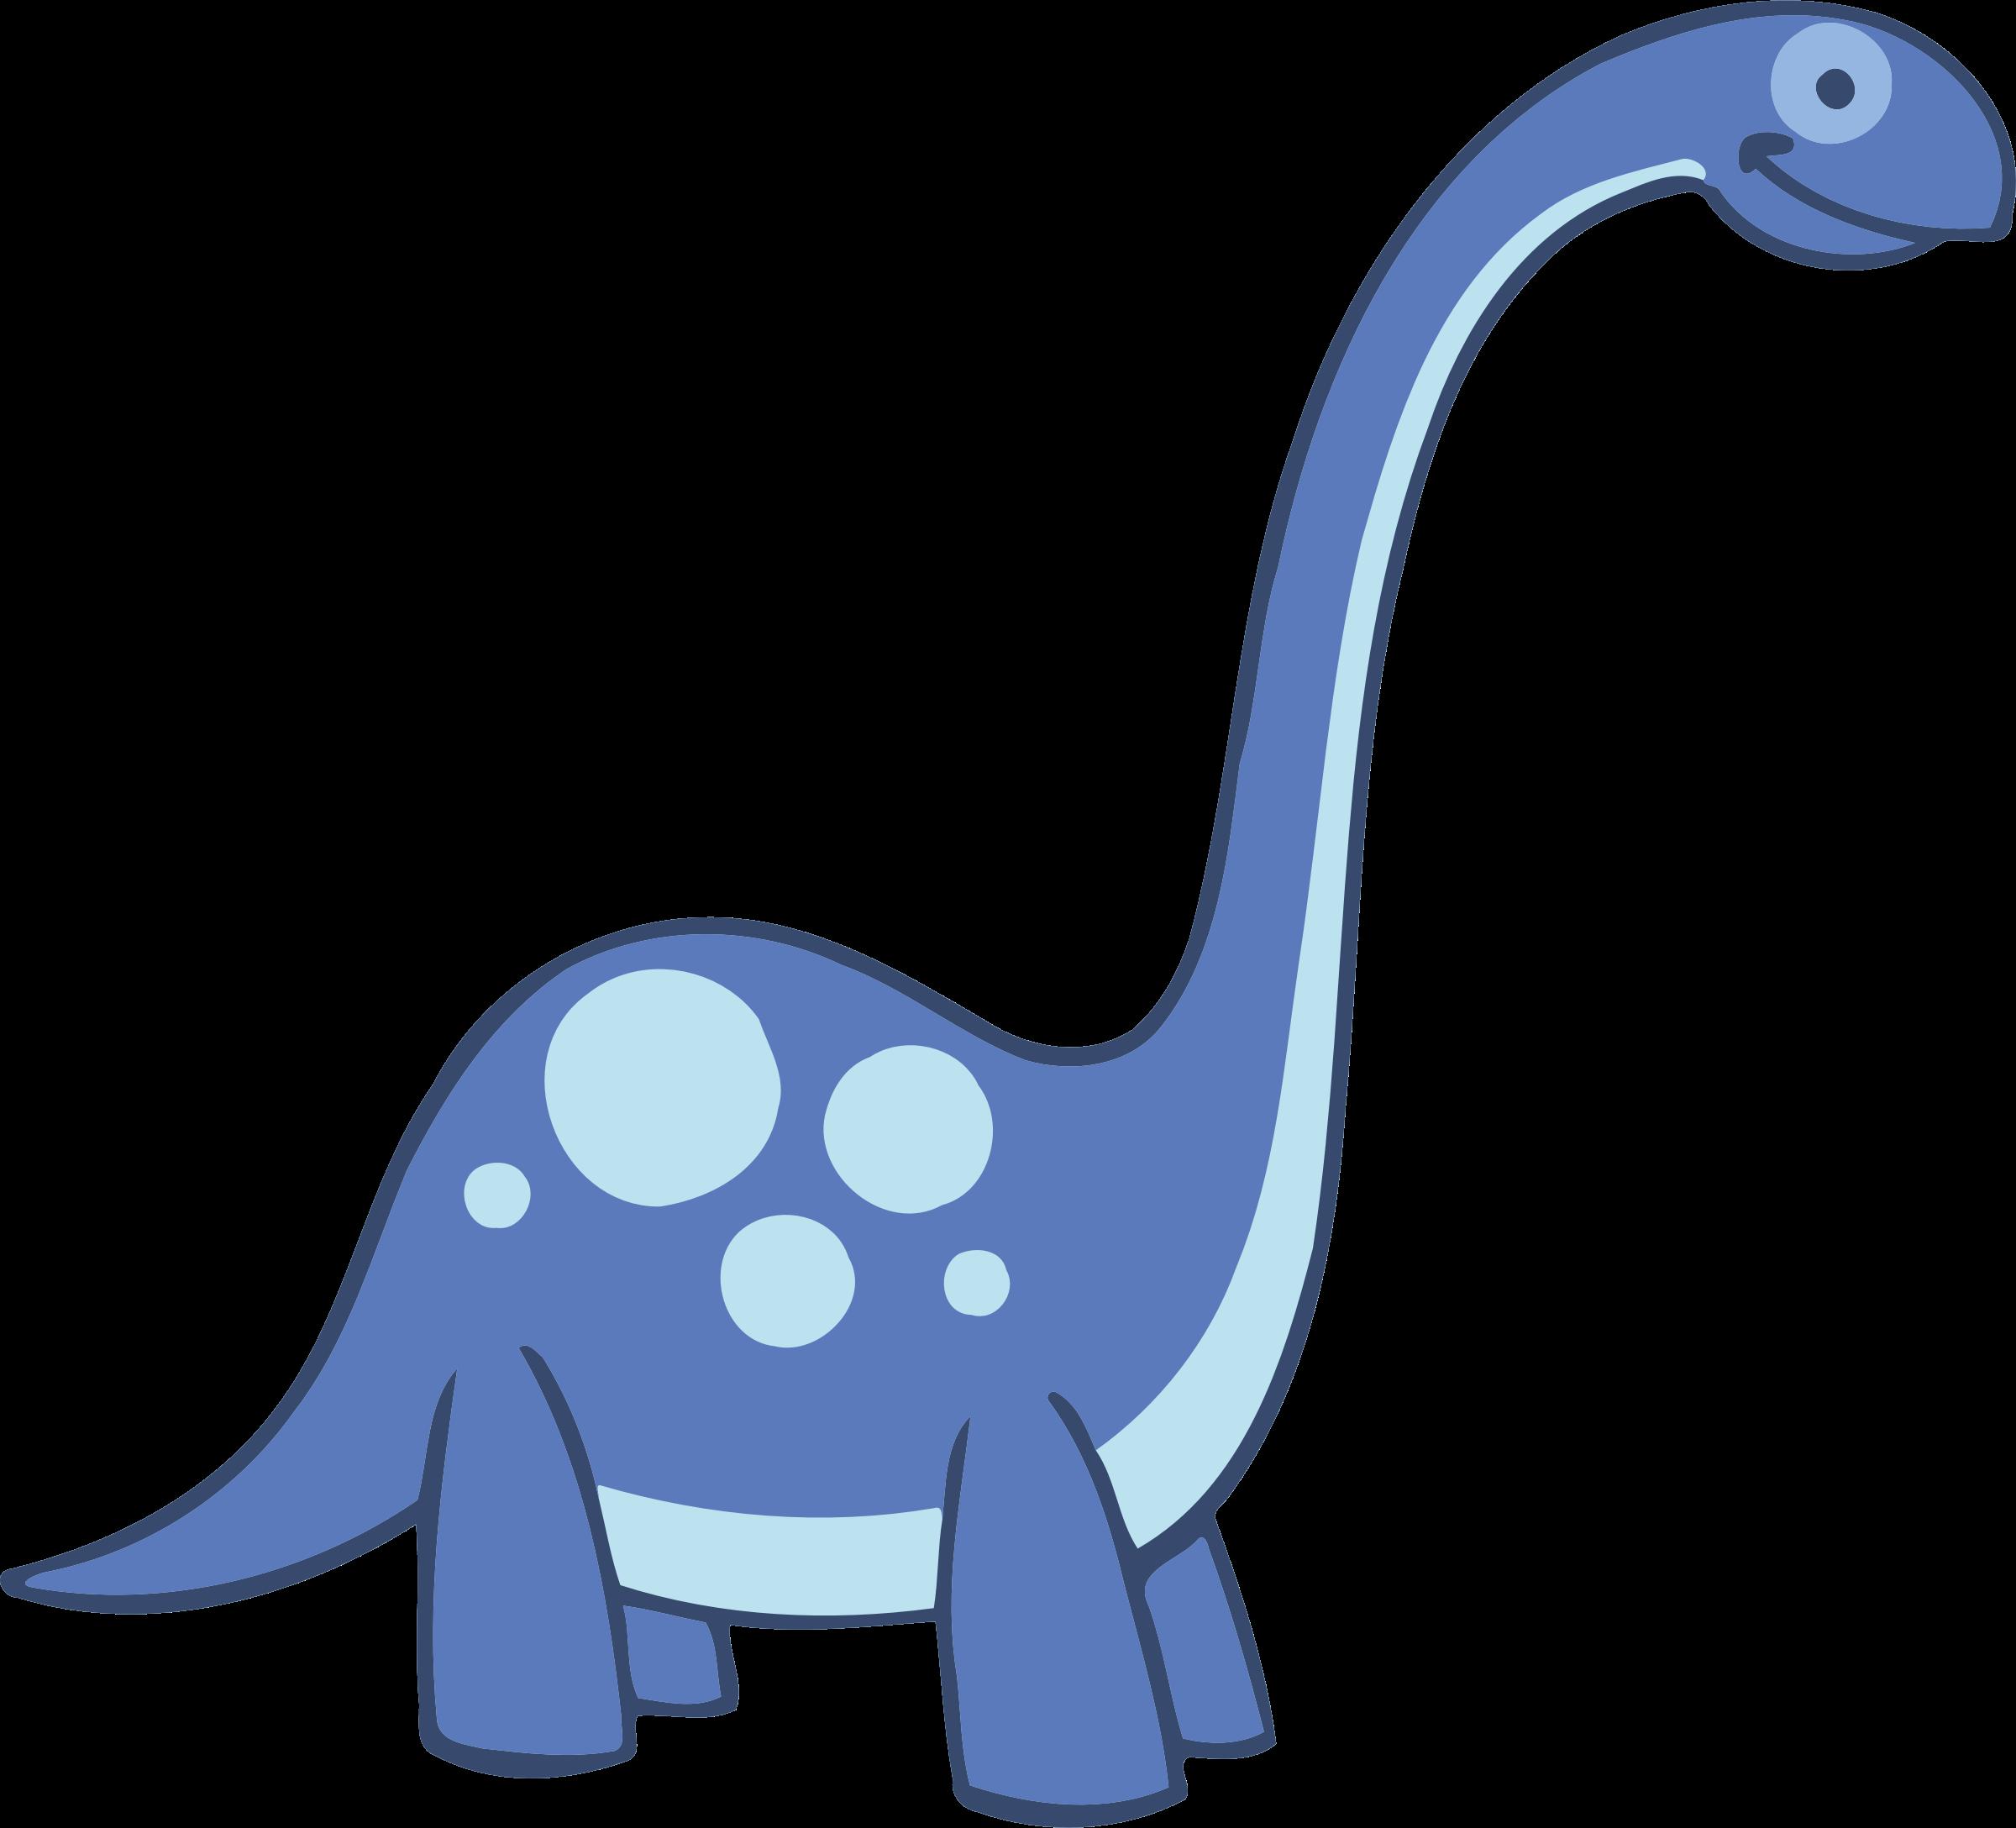 Brontosaurus clip art openclipart. Clipart dinosaur dinosaur extinction